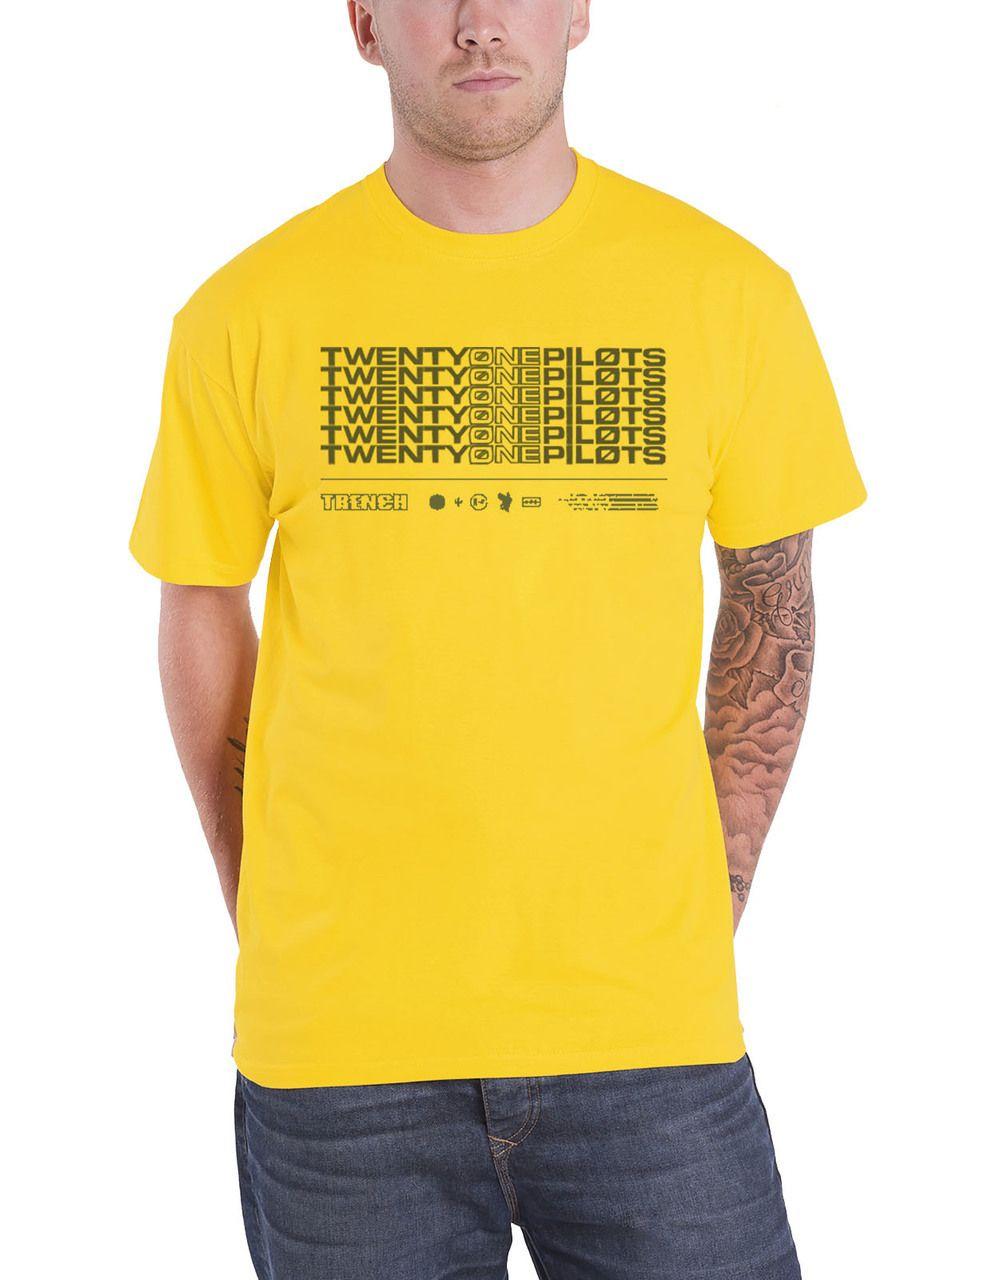 bc330b457 Twenty One Pilots T Shirt Trench Stacker Band Logo Mens Yellow - Paradiso  Clothing